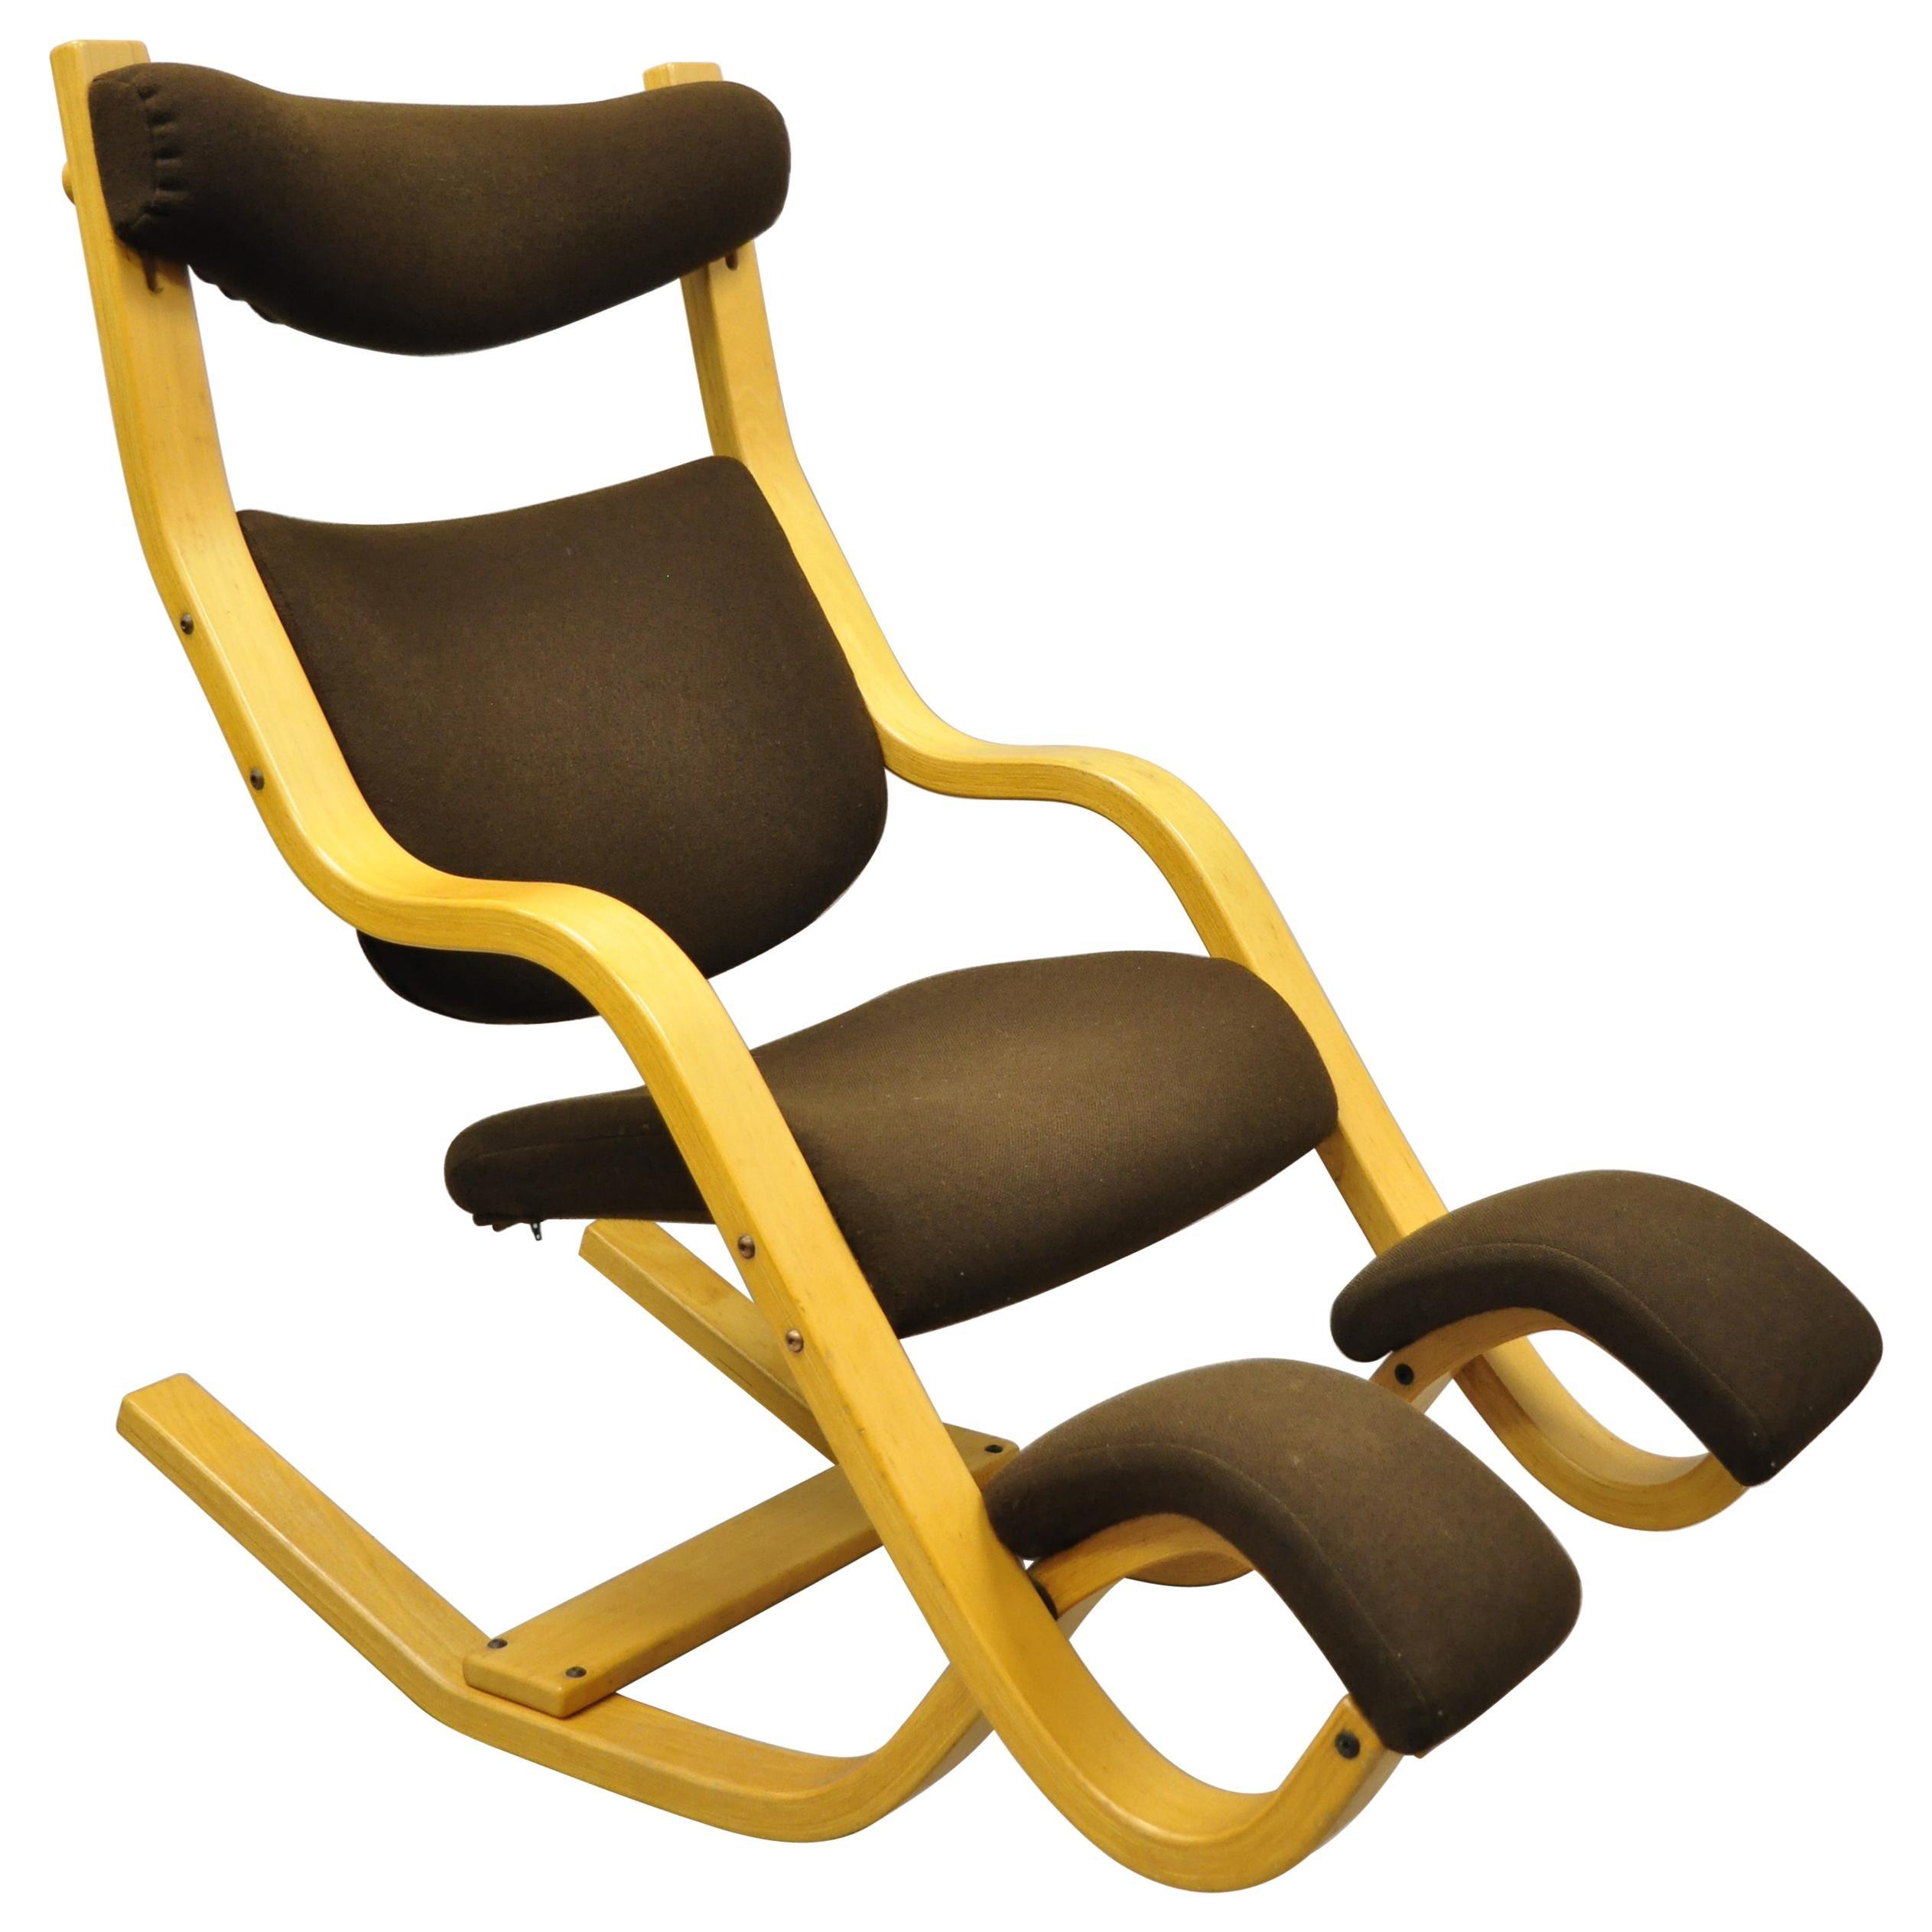 Vintage 1980s Stokke Varier Zero Gravity Balance Balans Bentwood Lounge Chair